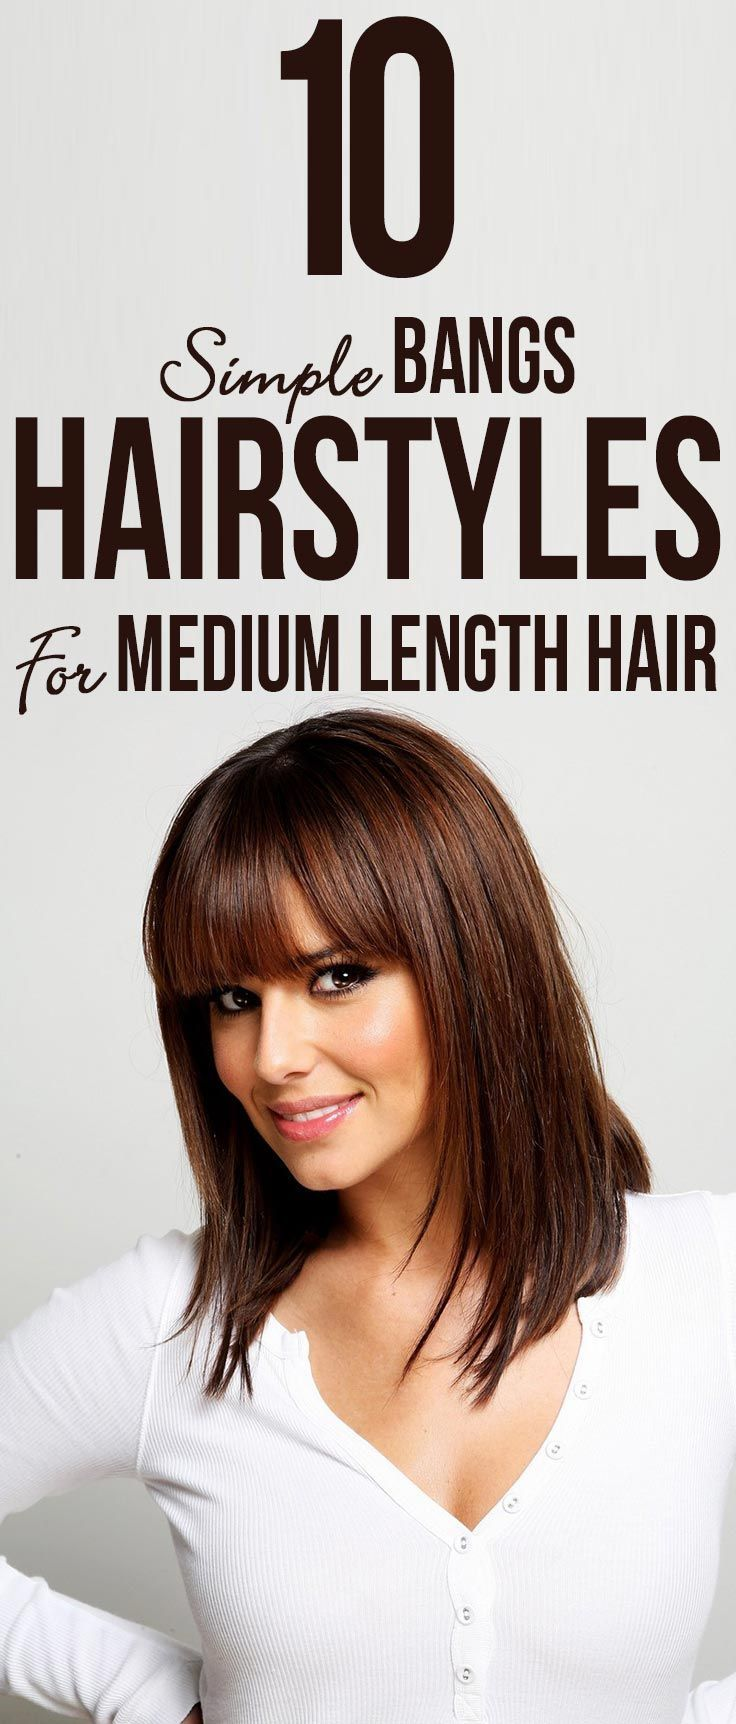 10 Simple Bangs Hairstyles For Medium Length Hair…